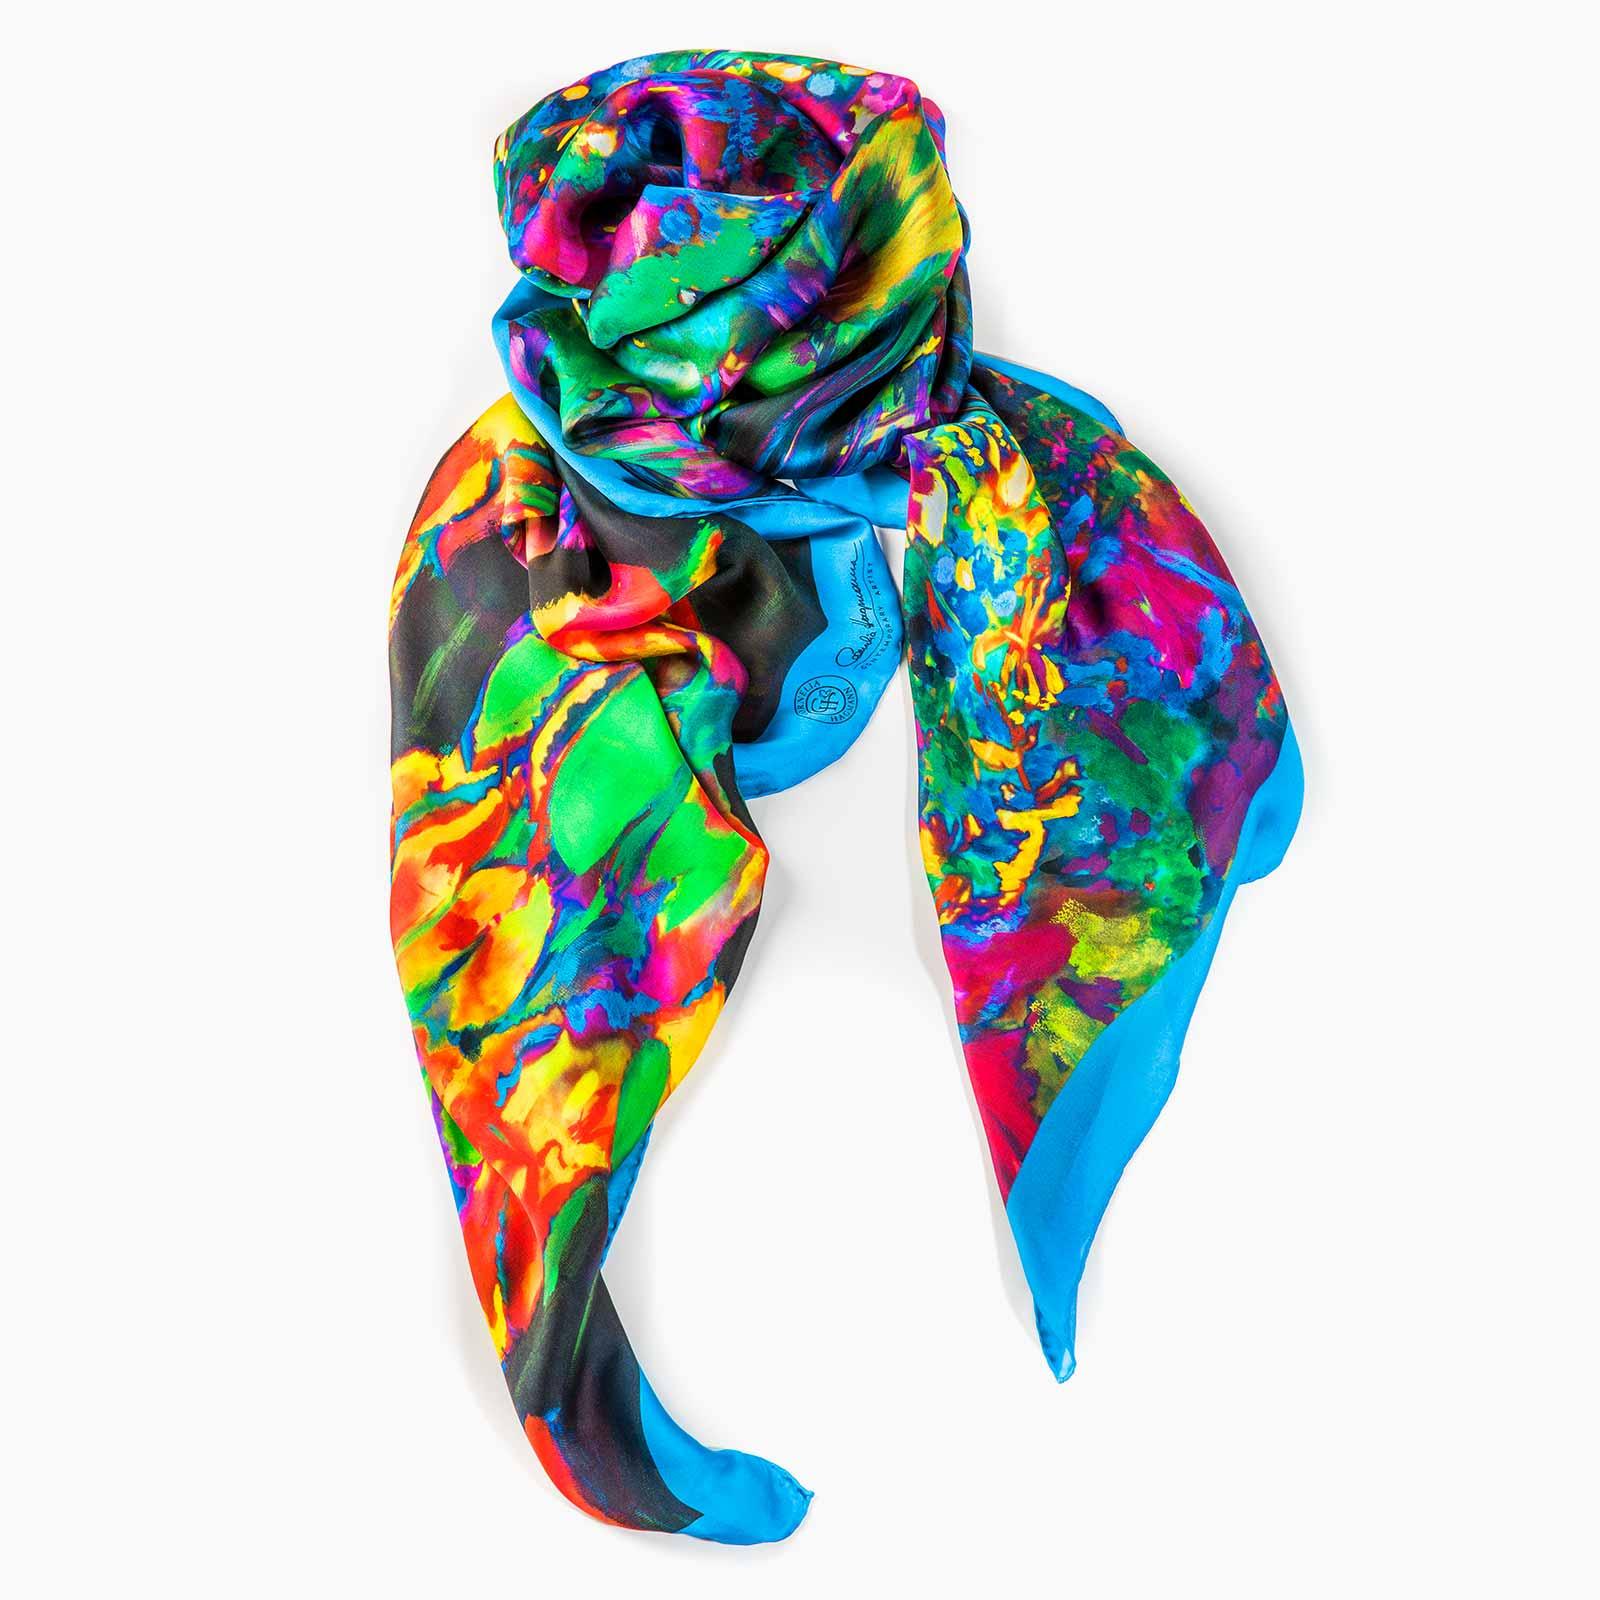 Cornelia Hagmann Contemporary Artist La Galleria Silk Scarf Peace Blue, Seidenschal, sciarpa di seta, foulard soie,